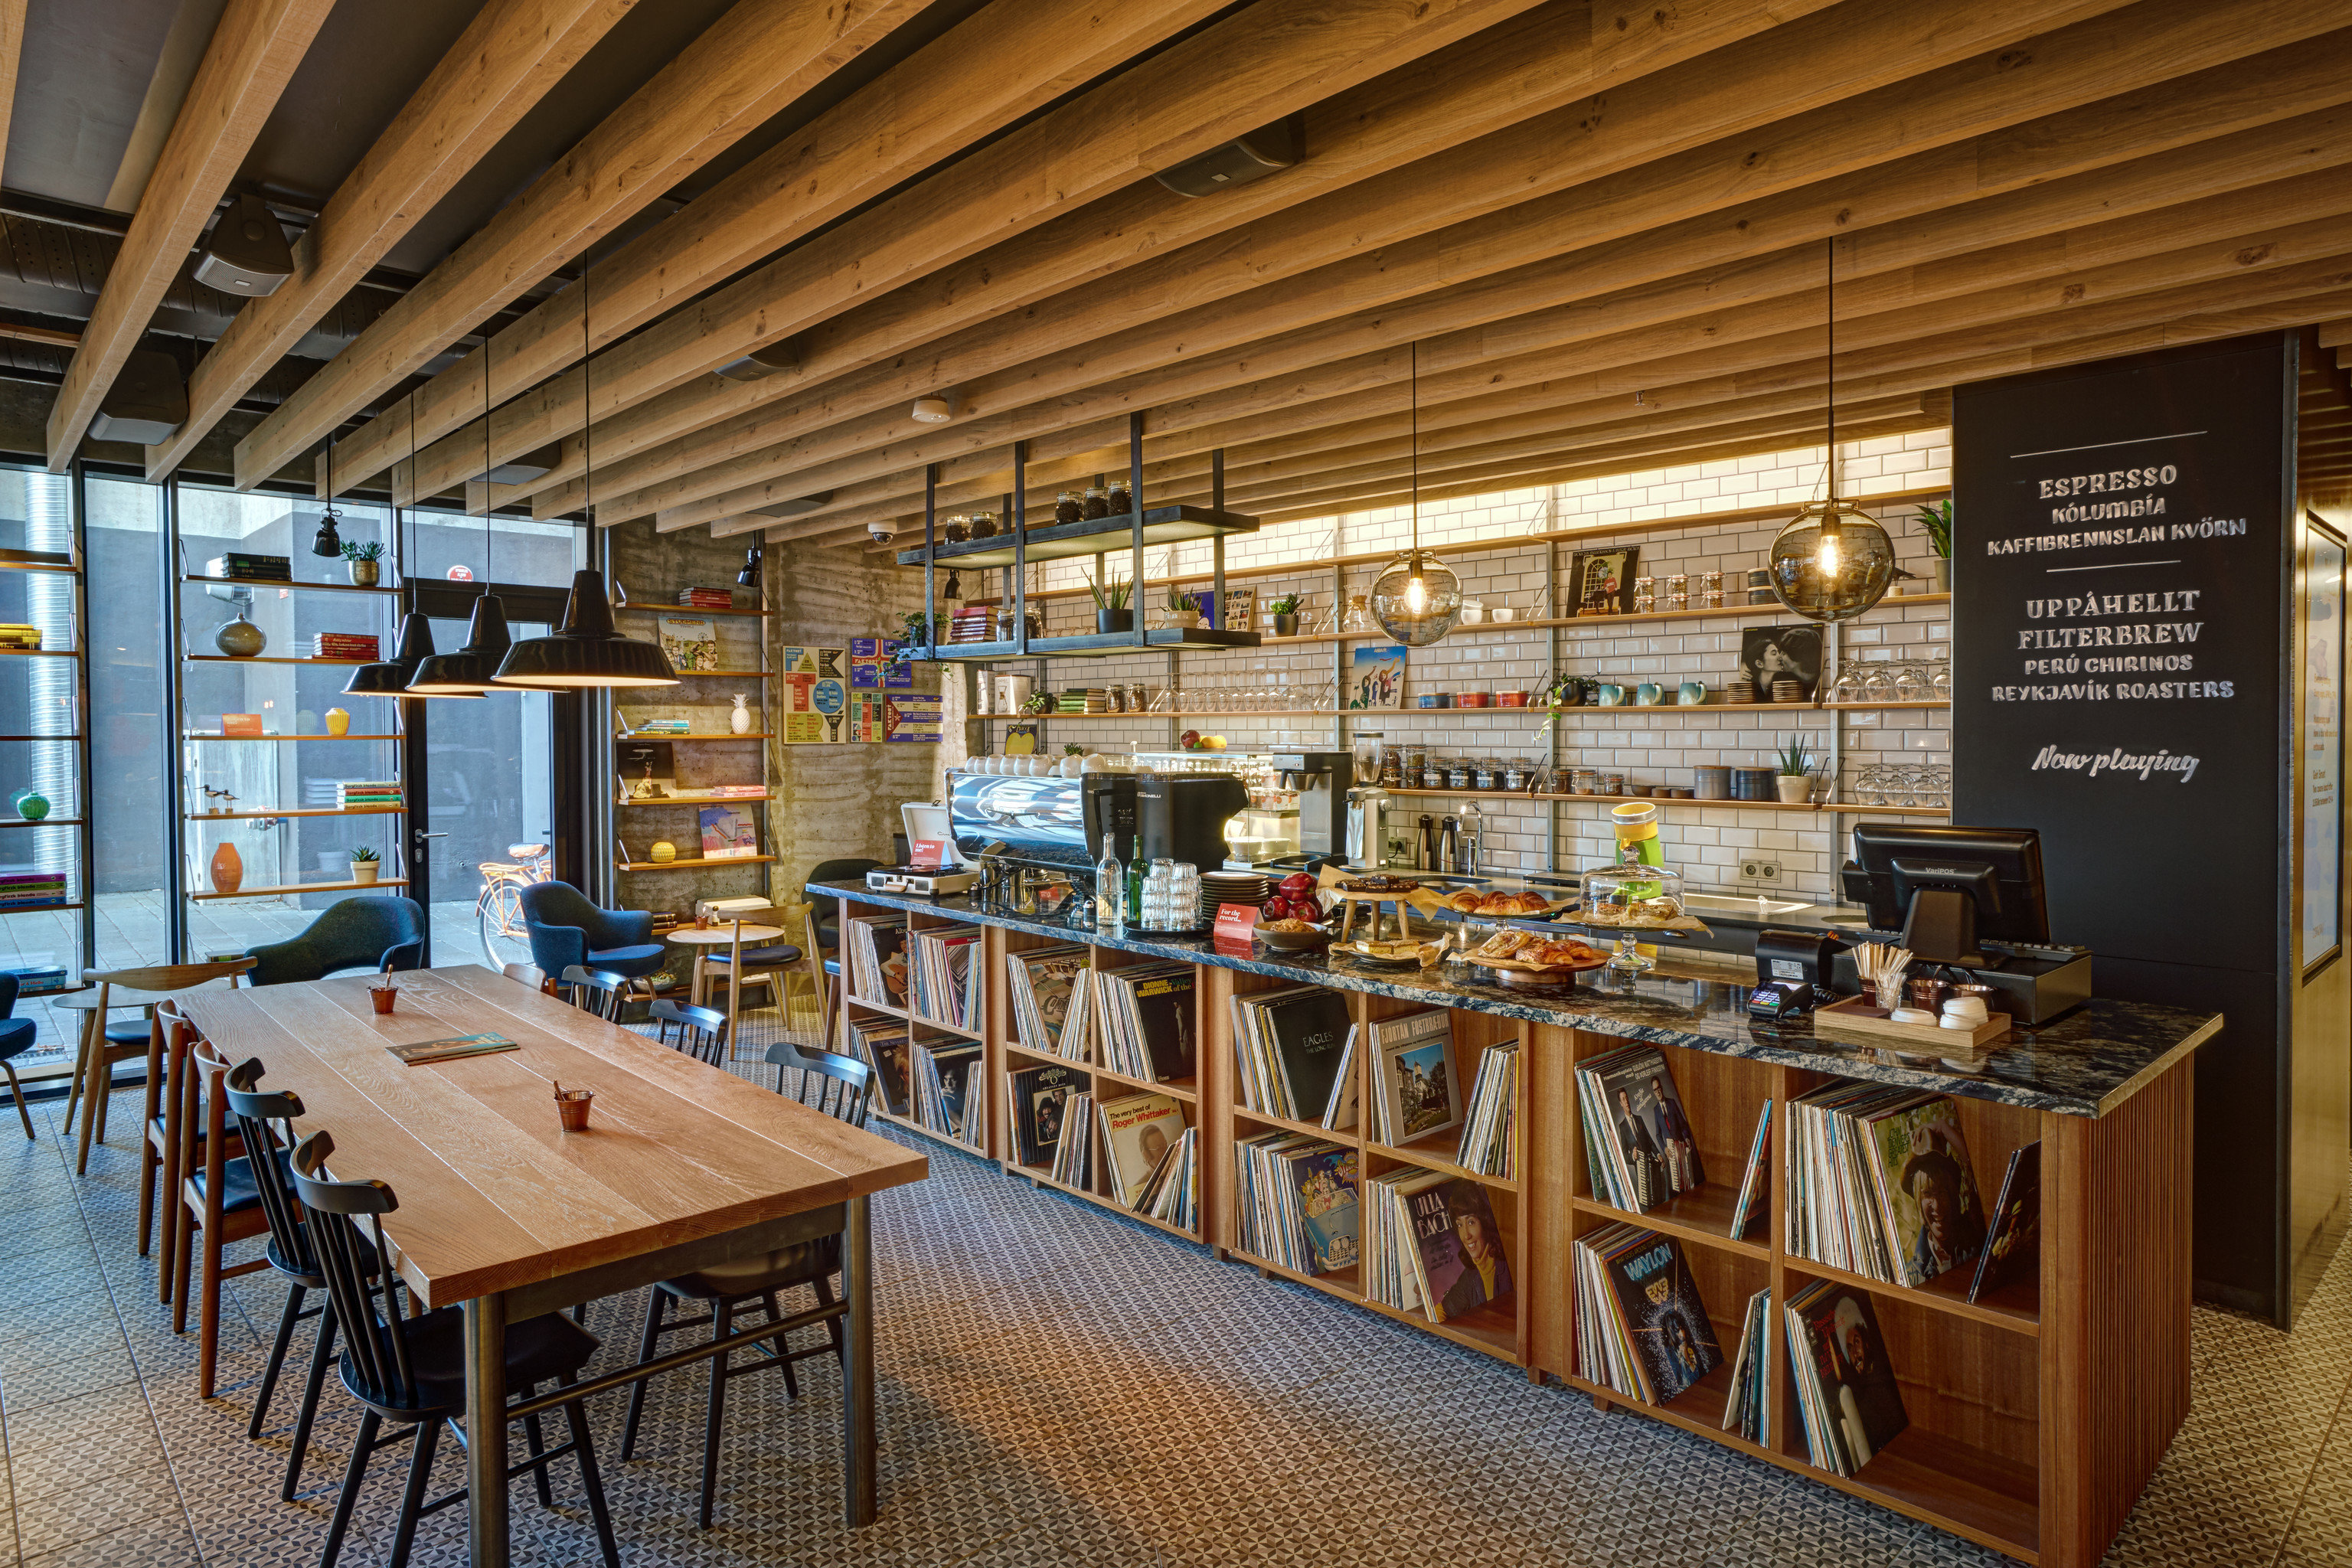 Boutique Hotels Hotels Iceland Reykjavík table indoor building library wood interior design restaurant bookselling